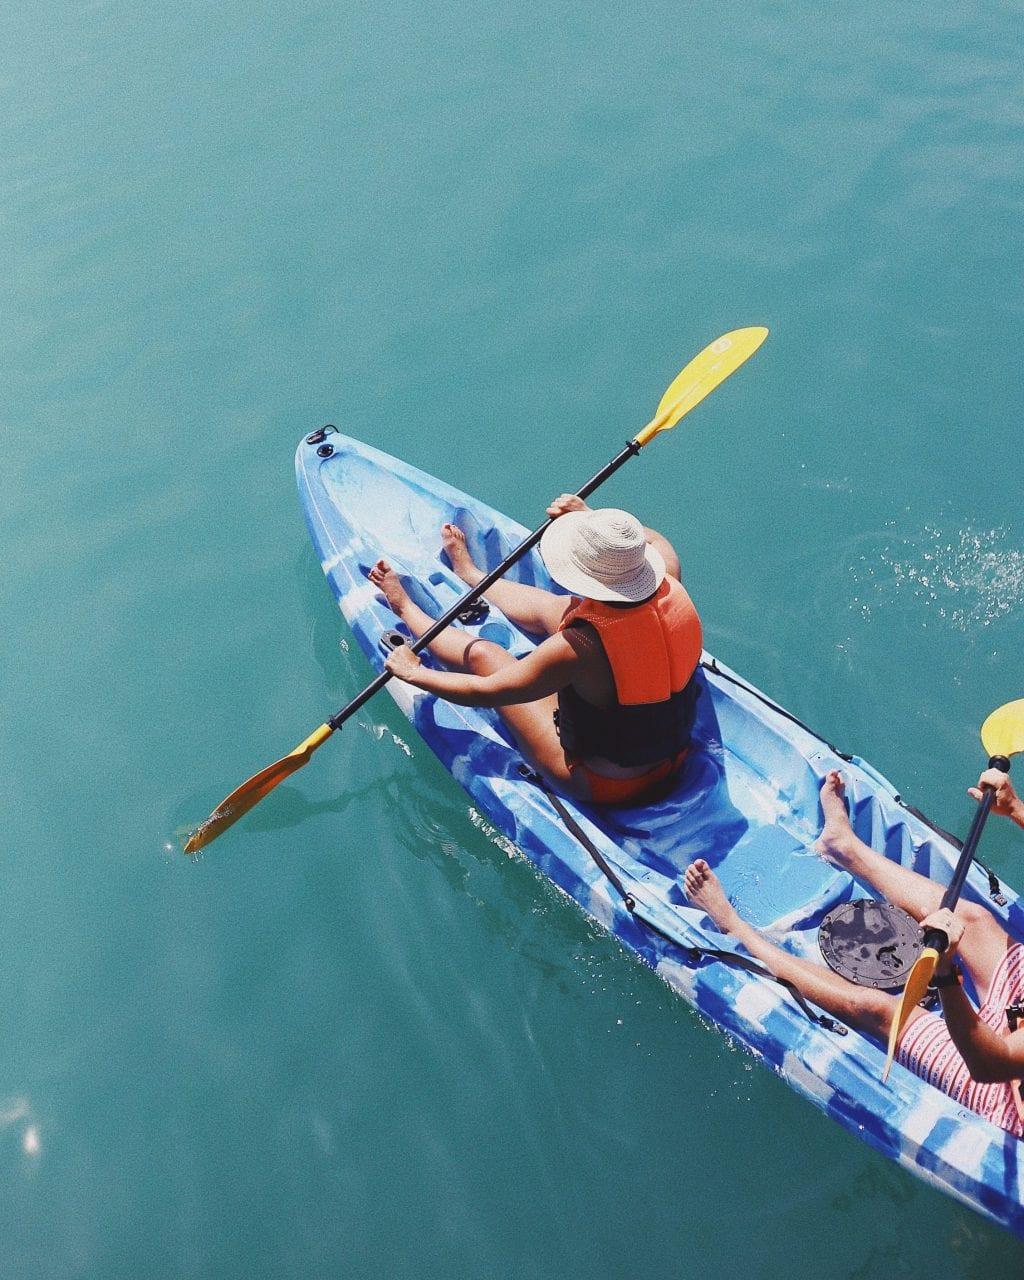 Kayak - taylor-simpson-ROXggehIu7M-unsplash